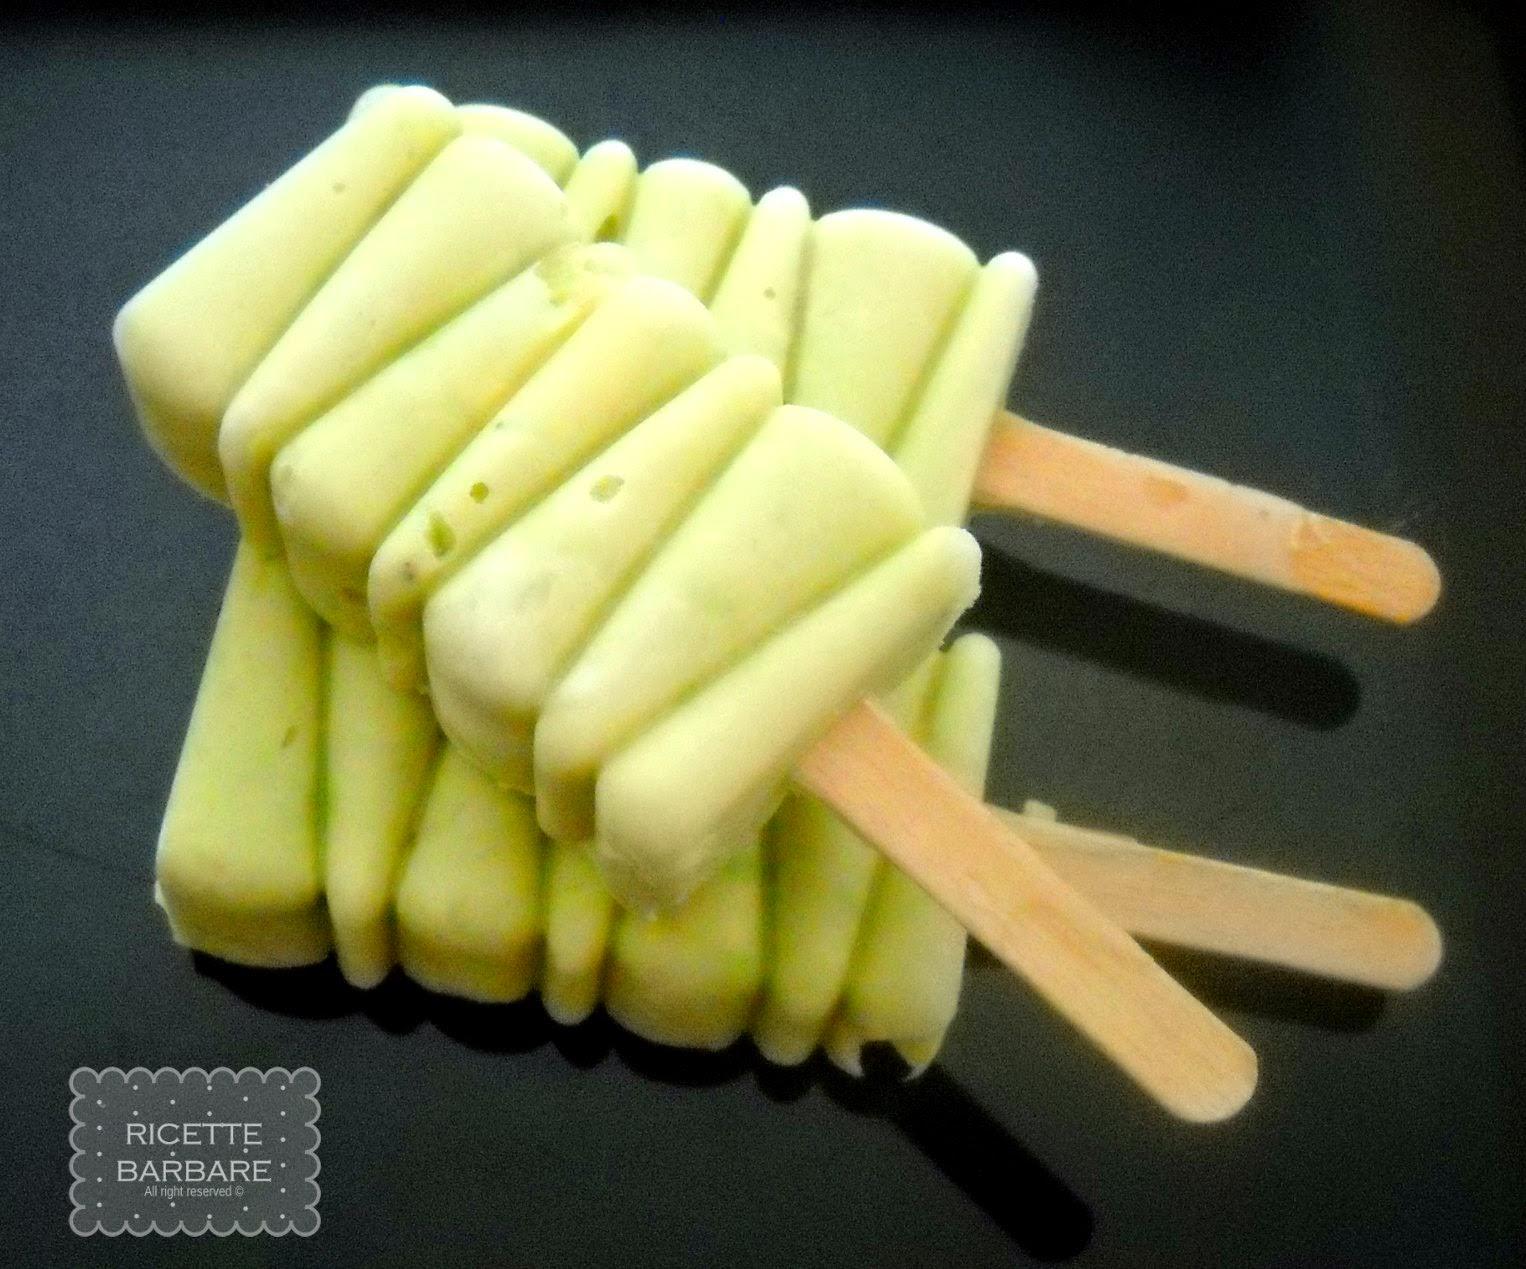 Ricette Barbare: Avocado yogurt pops